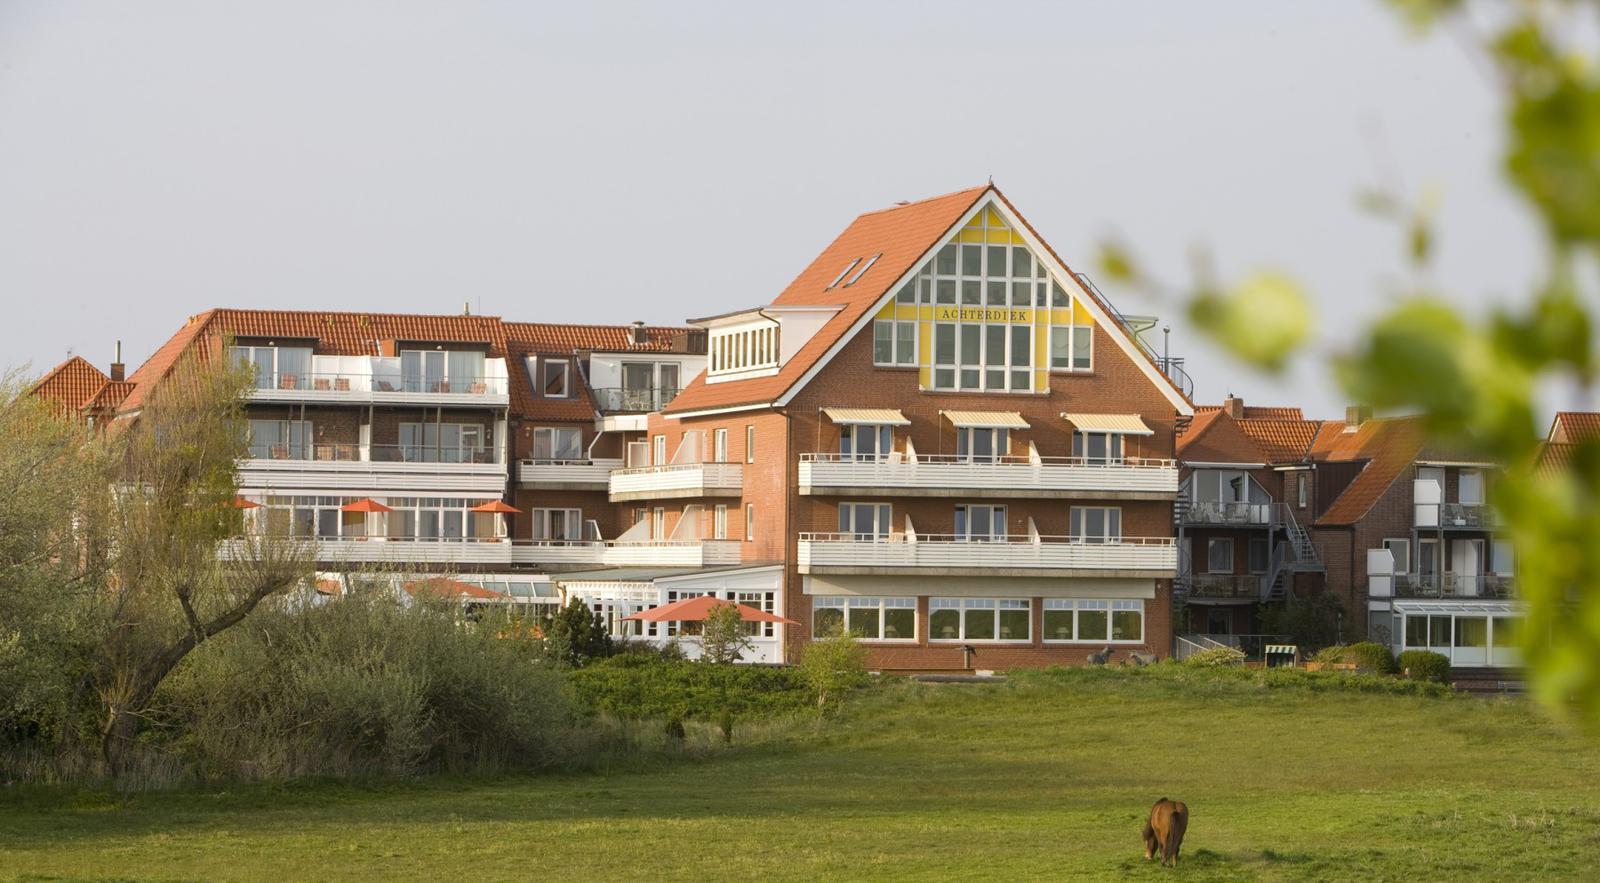 Romantikhotel Achterdiek